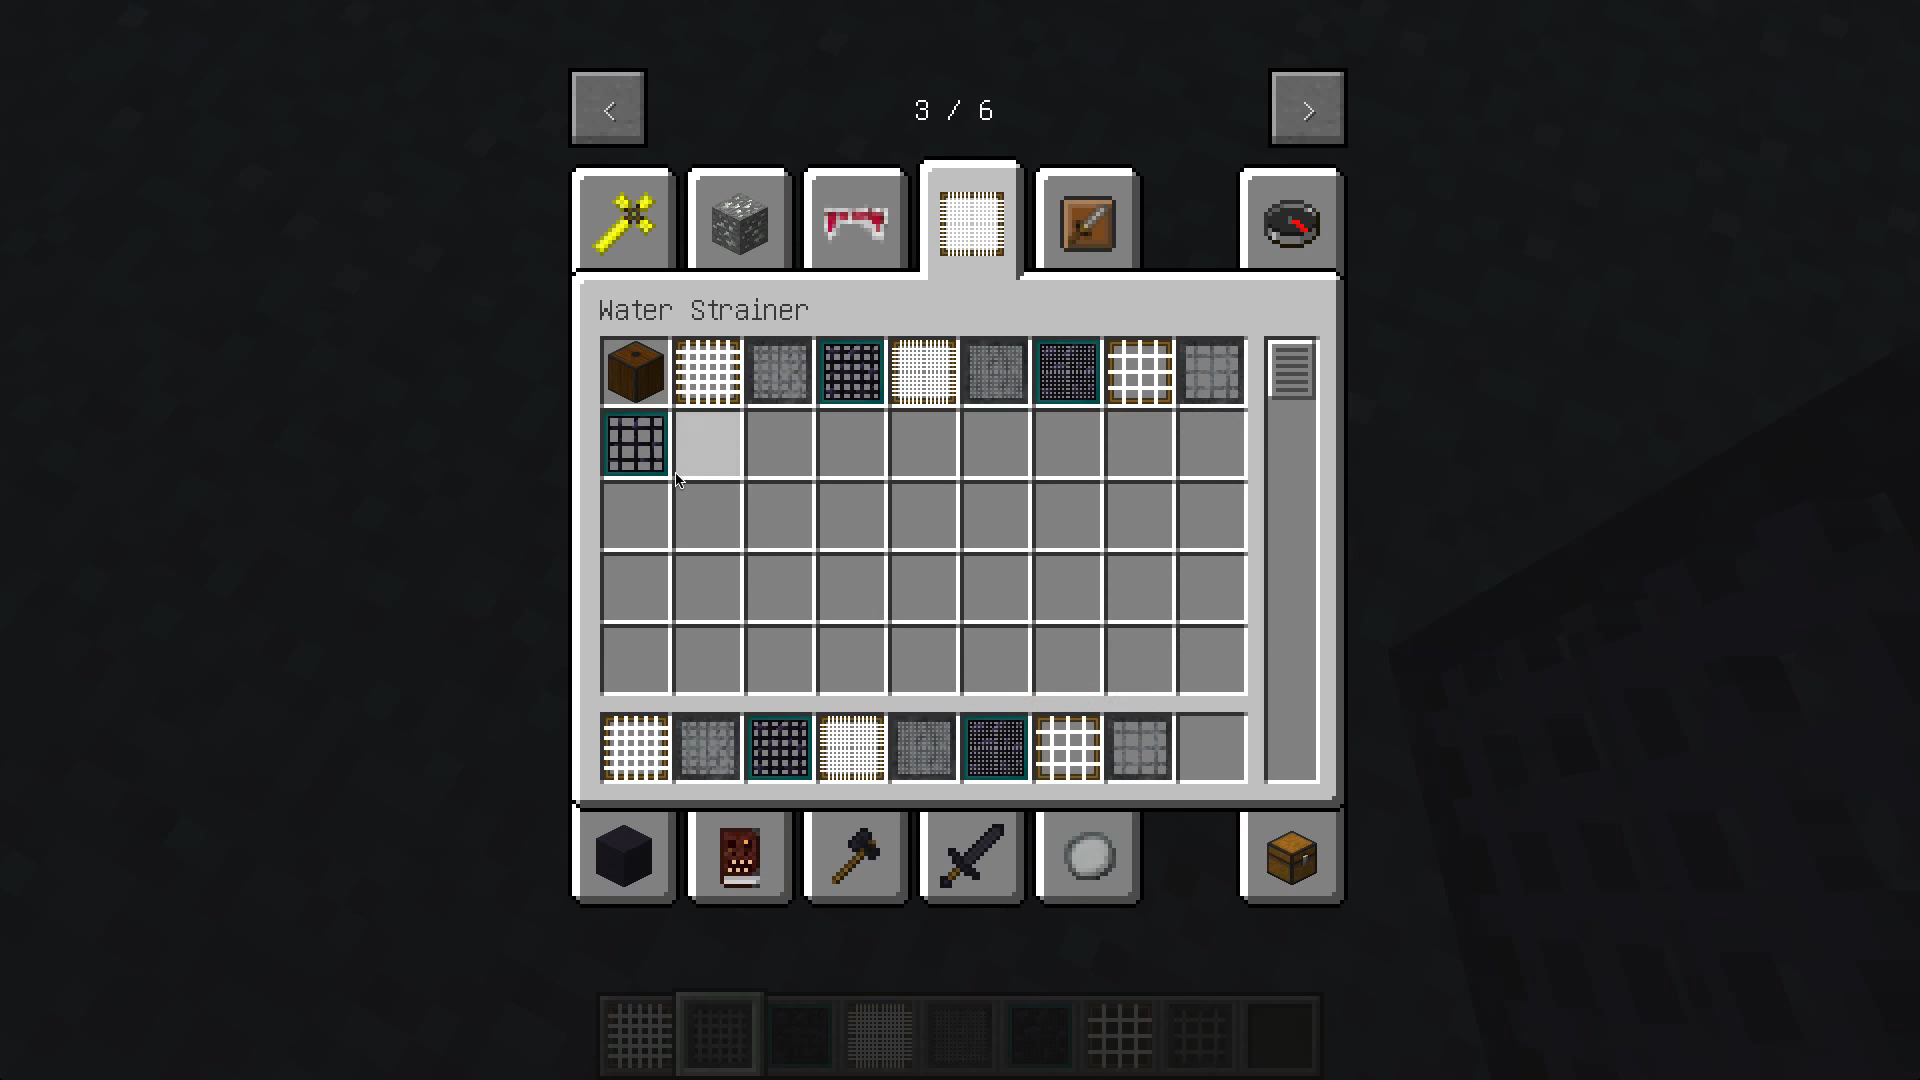 Мод «Water Strainer» (Фильтры для воды) дляМайнкрафт - скриншот 5